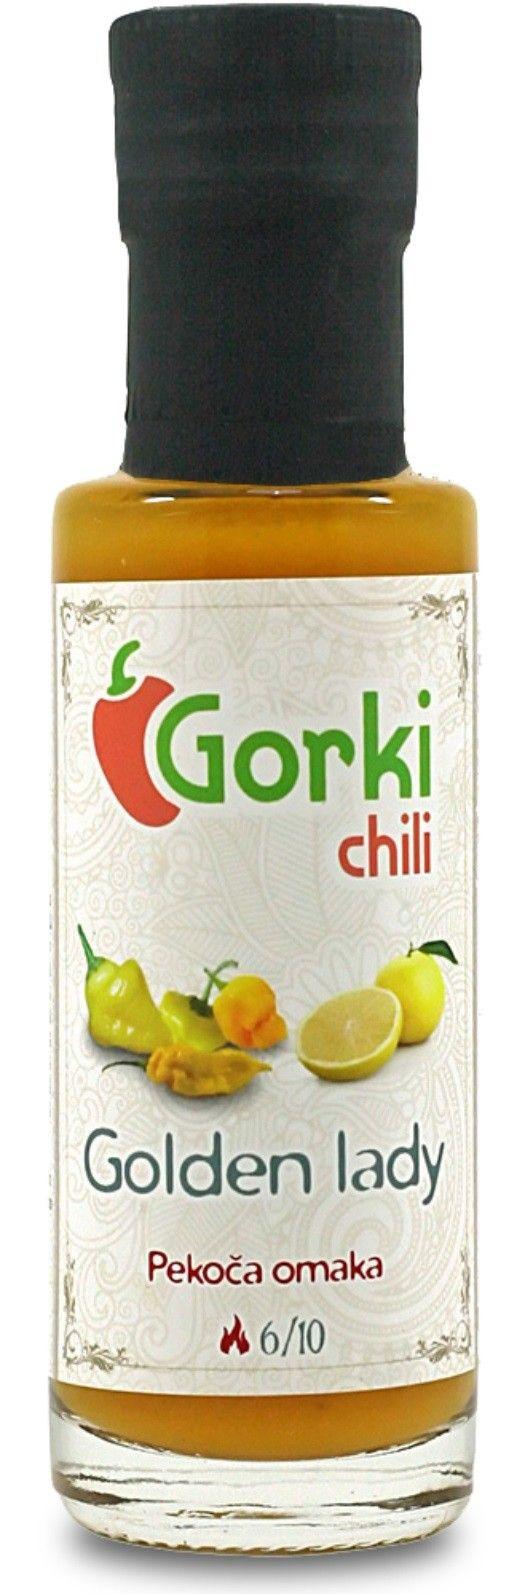 GORKI CHILI - SALSA PICCANTE GOLDEN LADY GR. 100